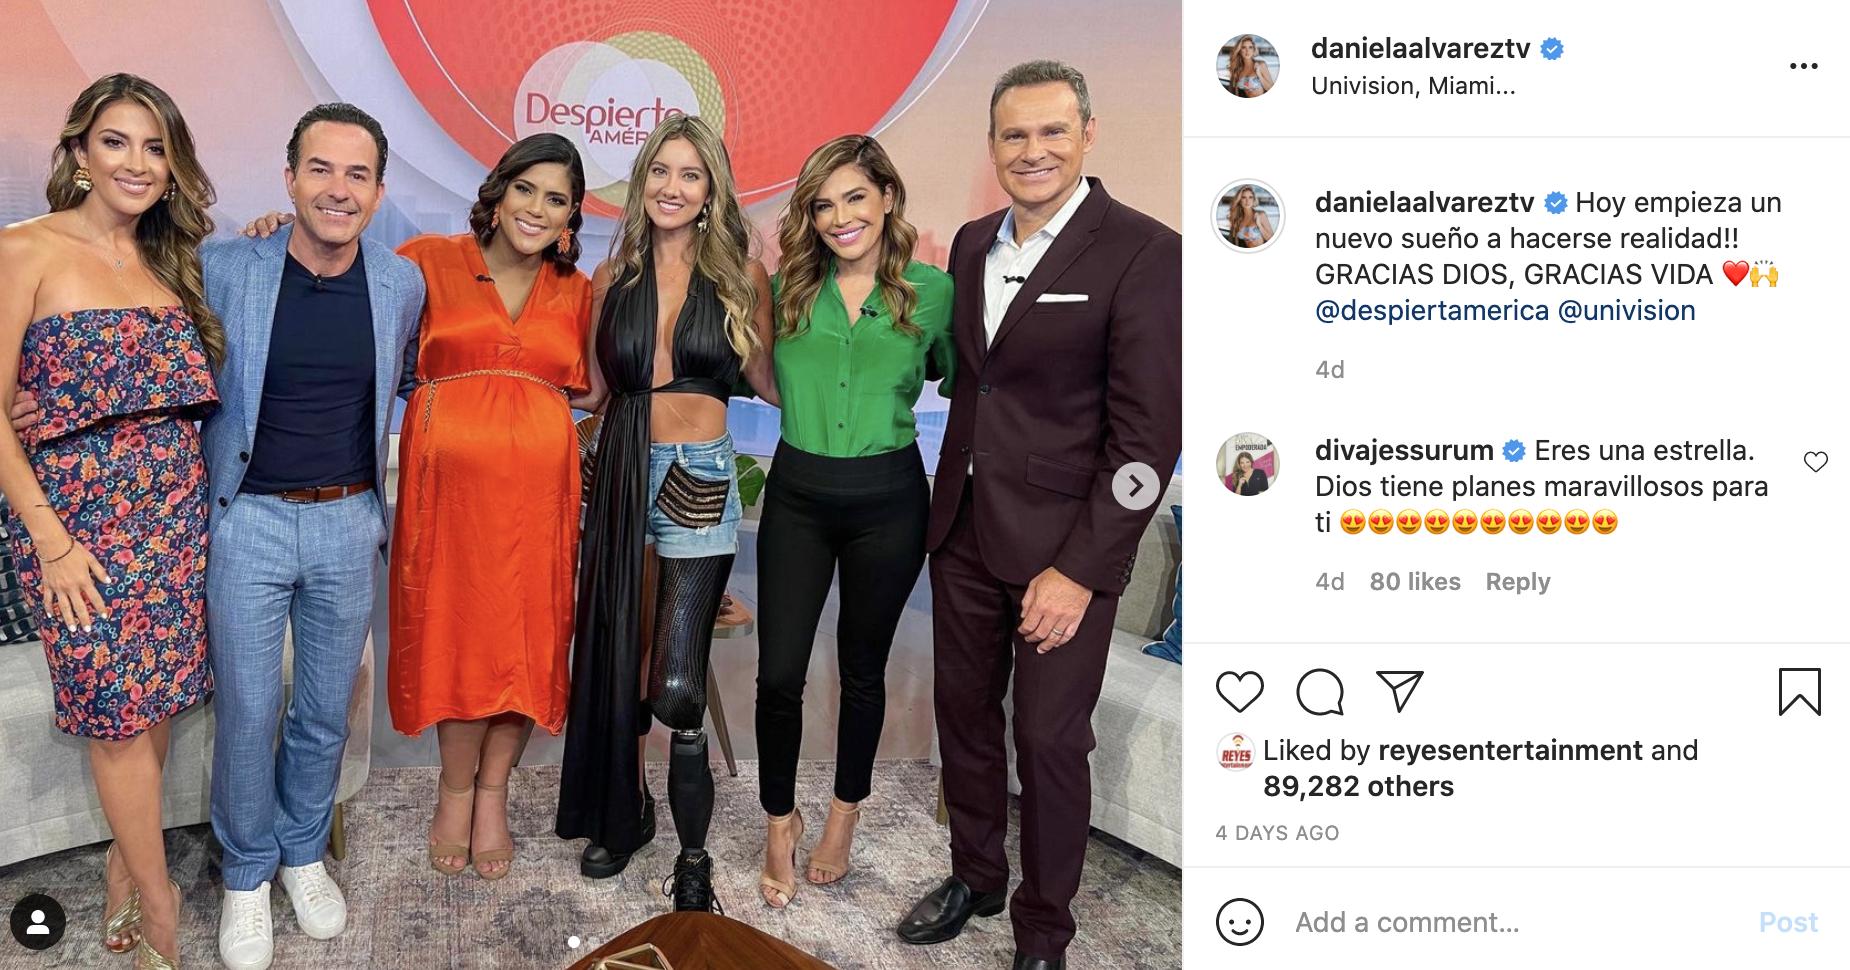 Daniella Alvarez en Despierta America de Univision